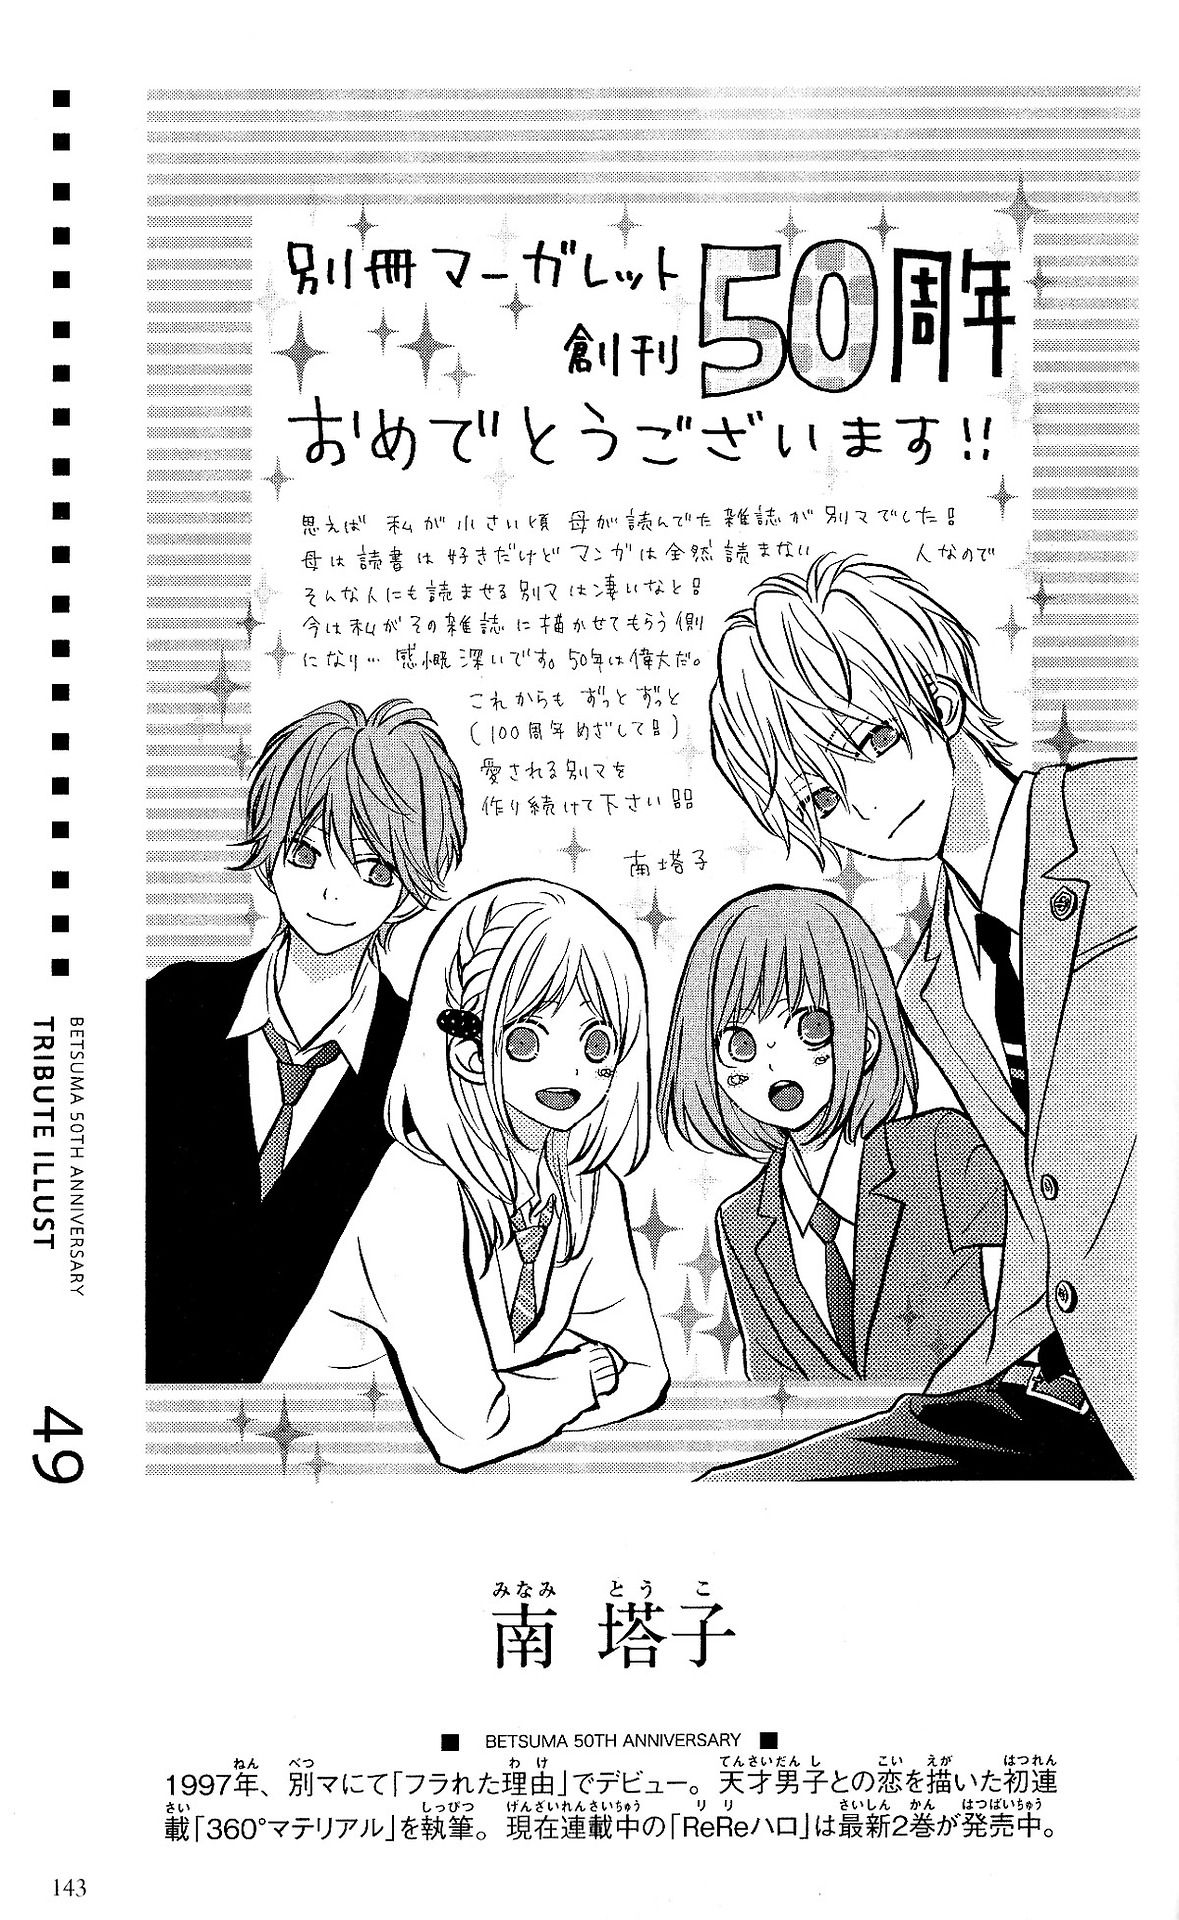 49 - Minami Touko sensei, the mangaka of ReRe Hello, congratulating Betsuma's 50th Anniversary.